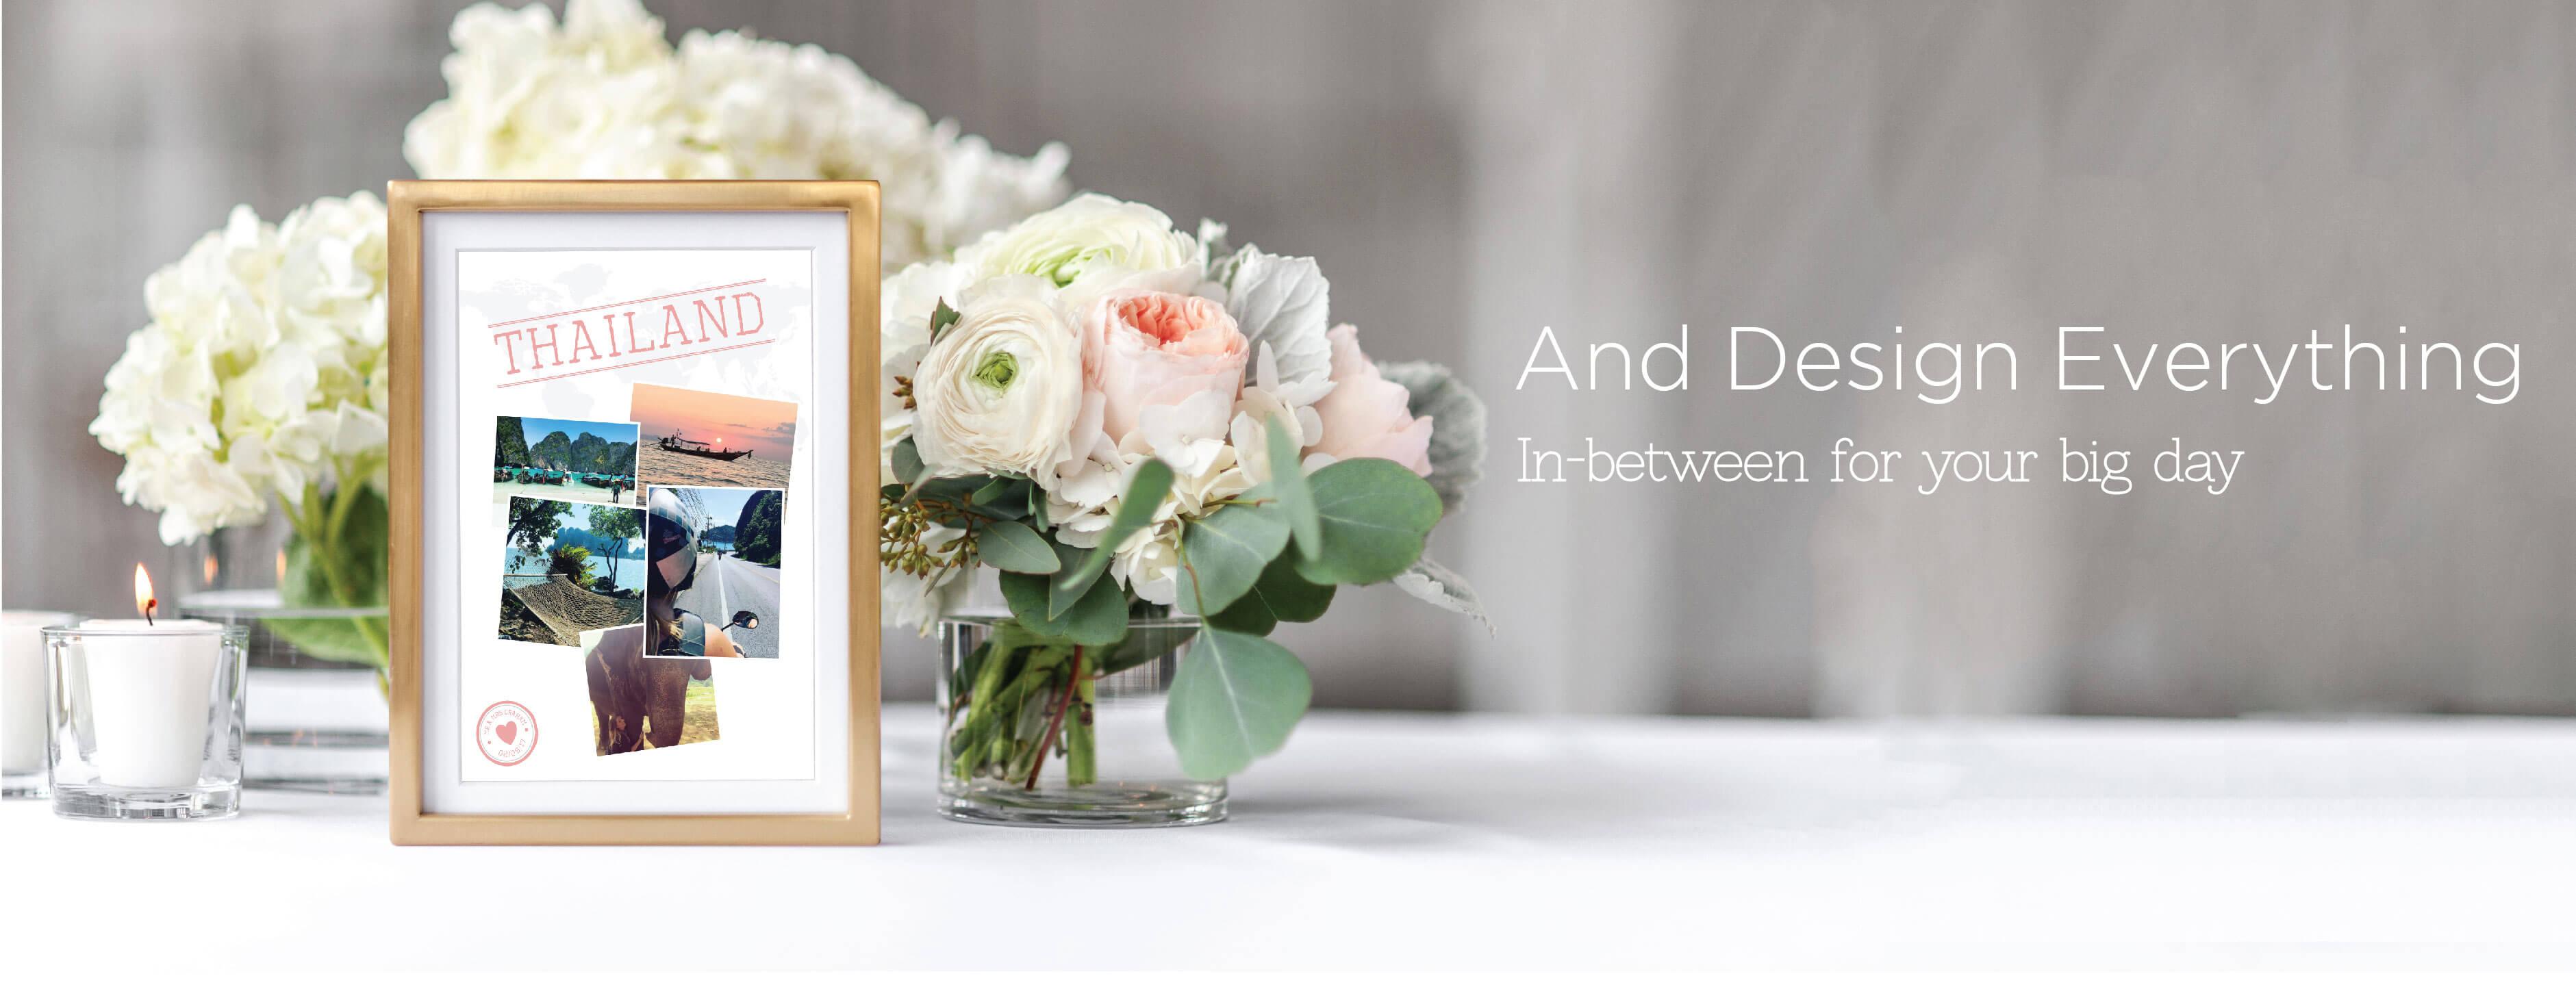 Wedding Invitations Manchester: Bespoke Wedding Stationery And Invitations